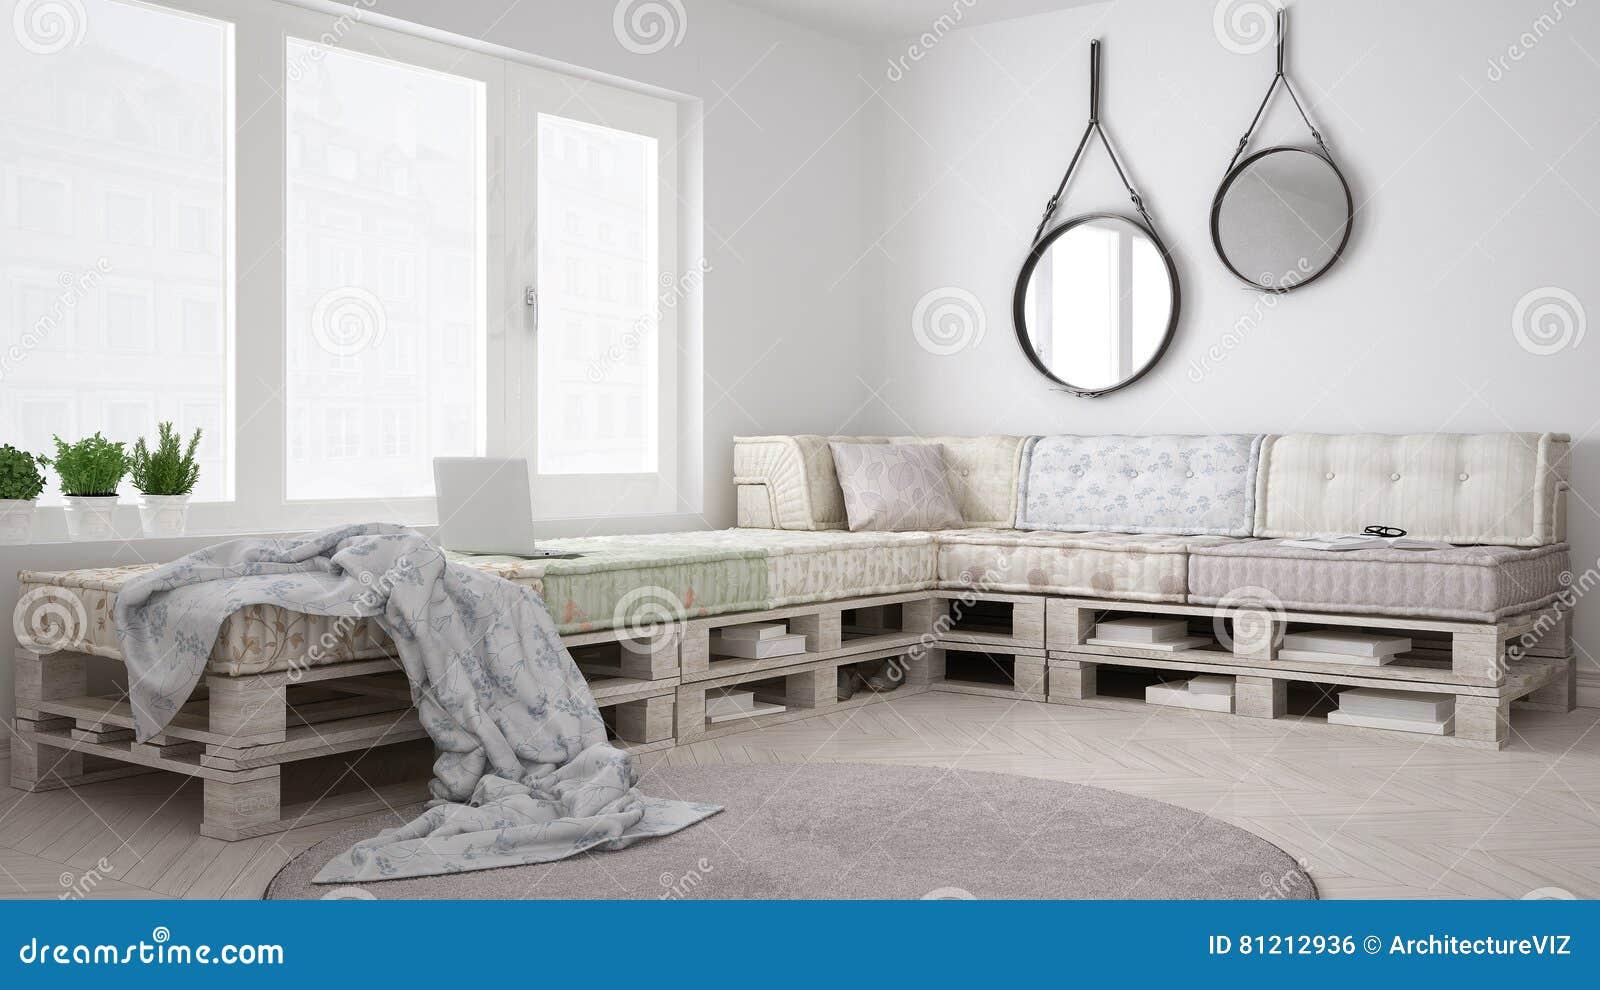 Diy pallet couch sofa scandinavian white living interior for Divan palette